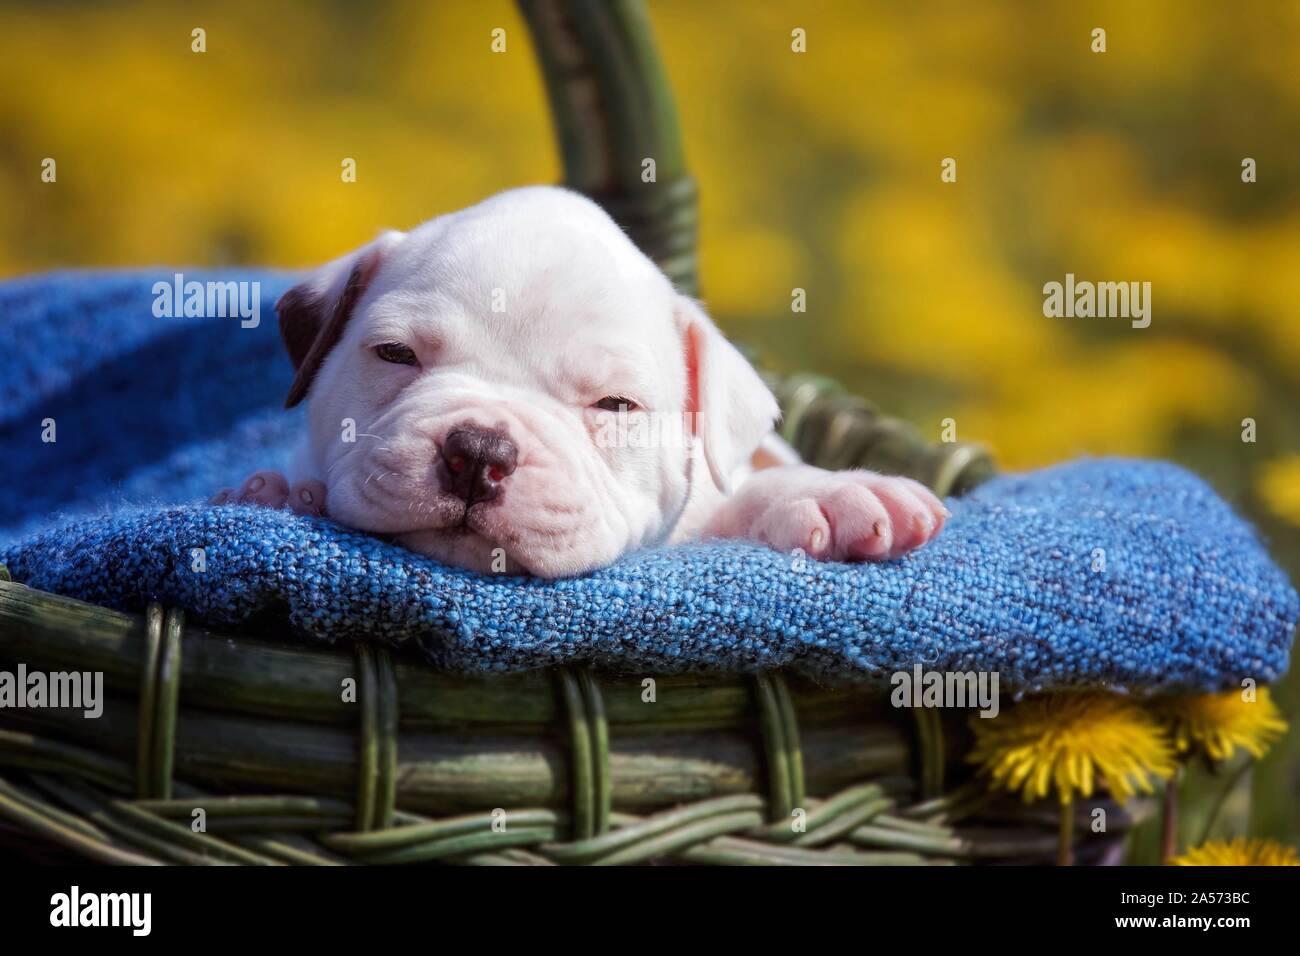 Cachorro bulldog americano en una cesta Foto de stock